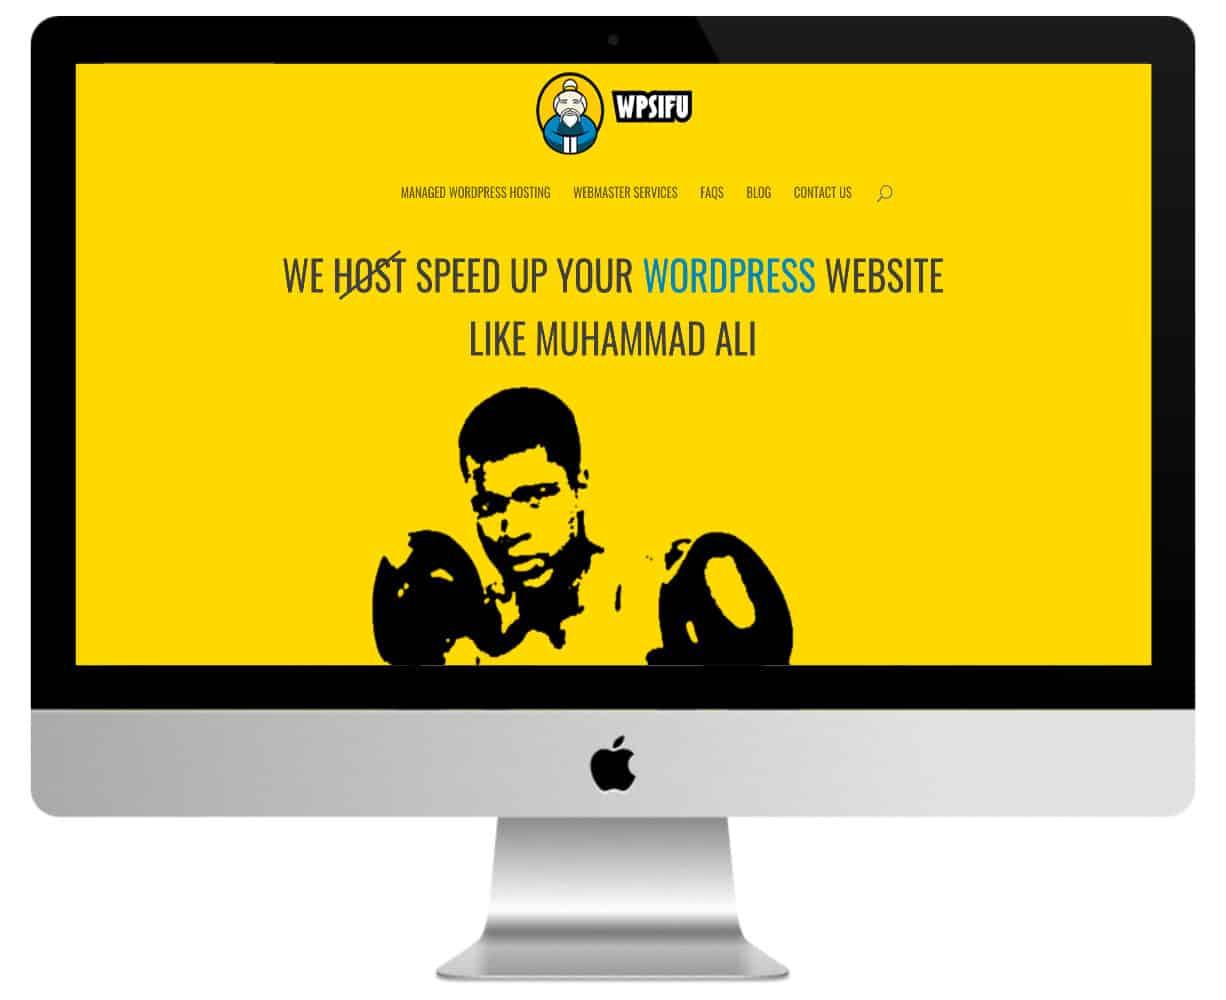 siteweb couleur jaune